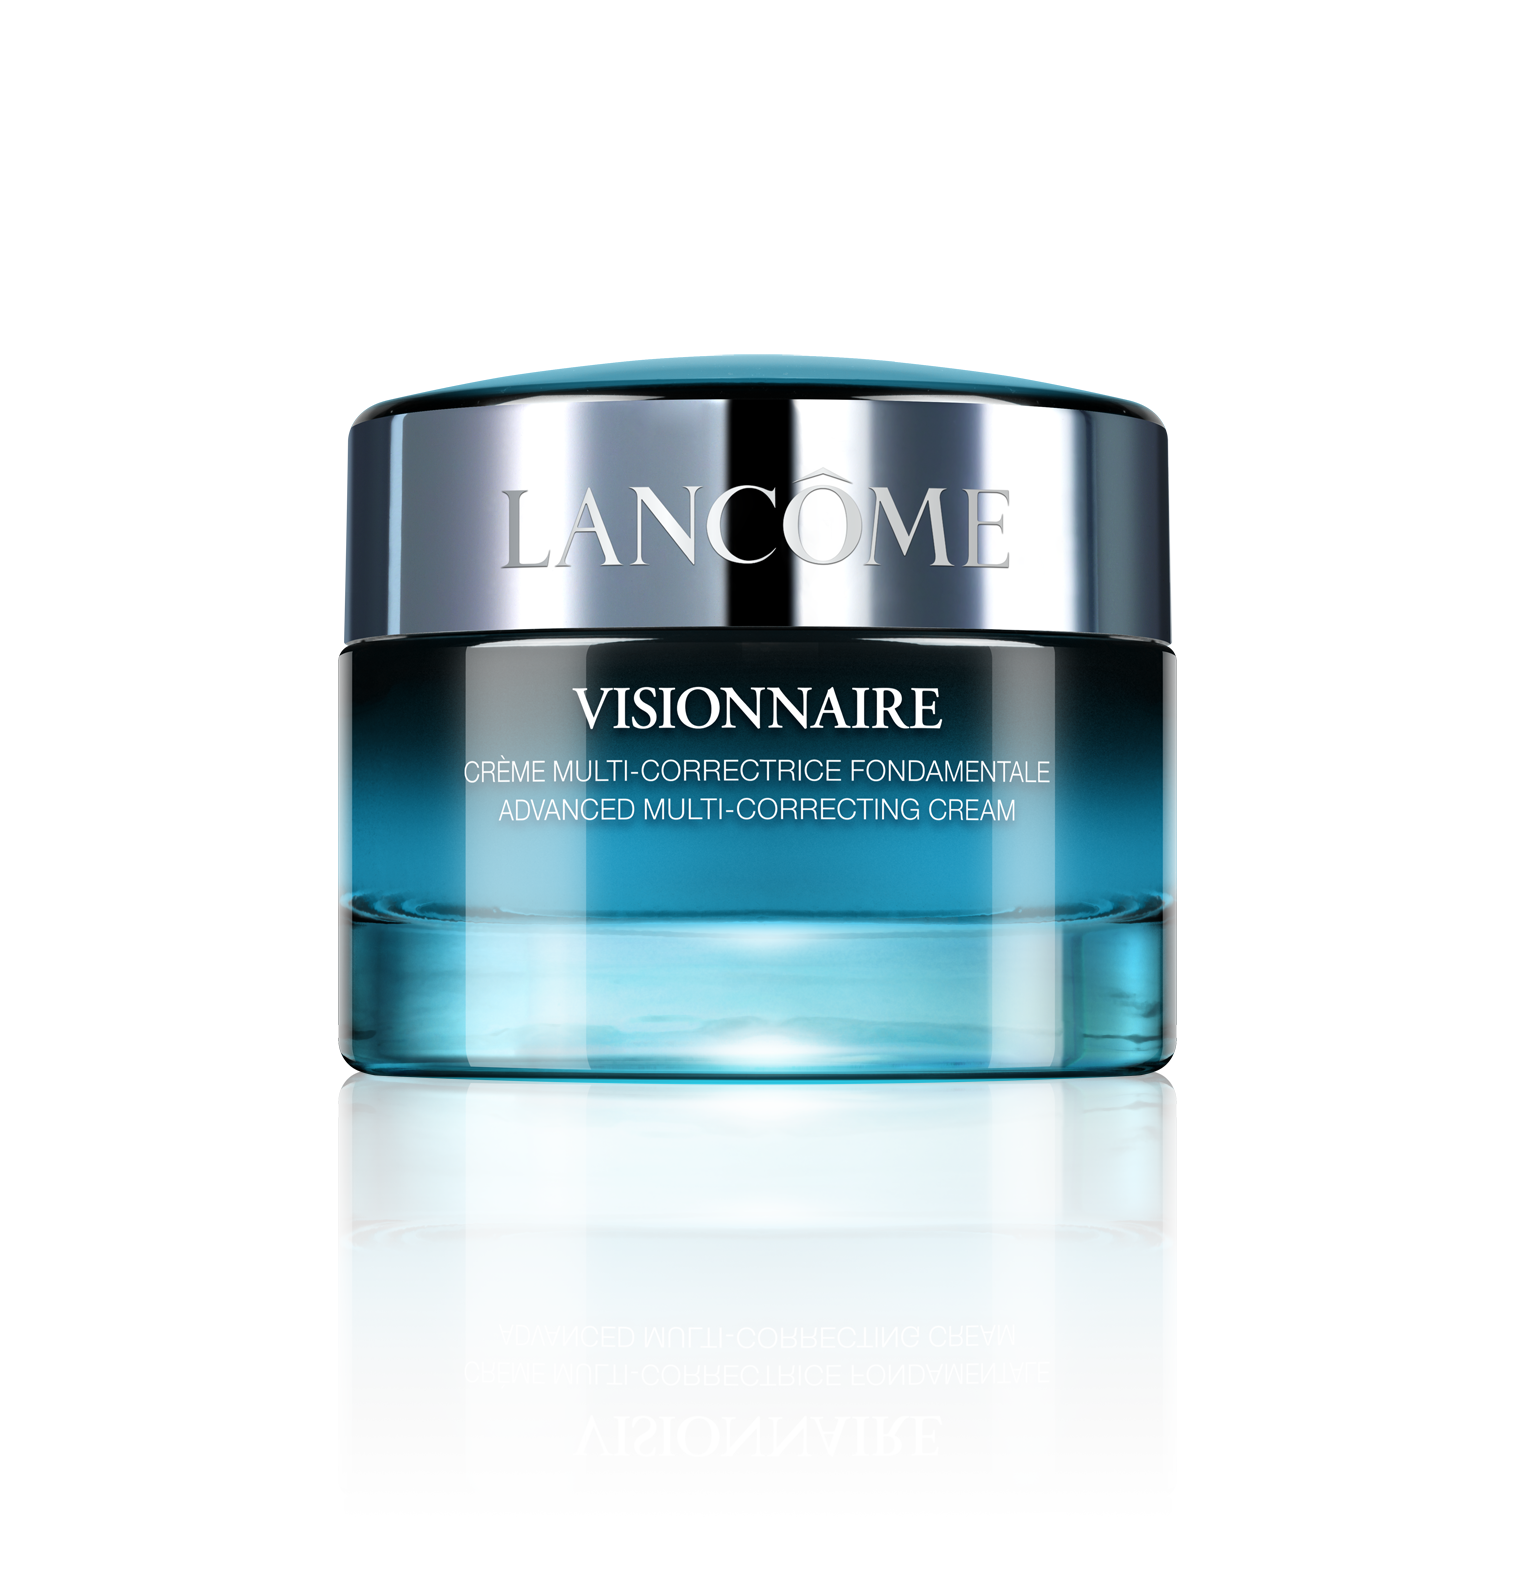 lancome-visionnaire-cream-packshot